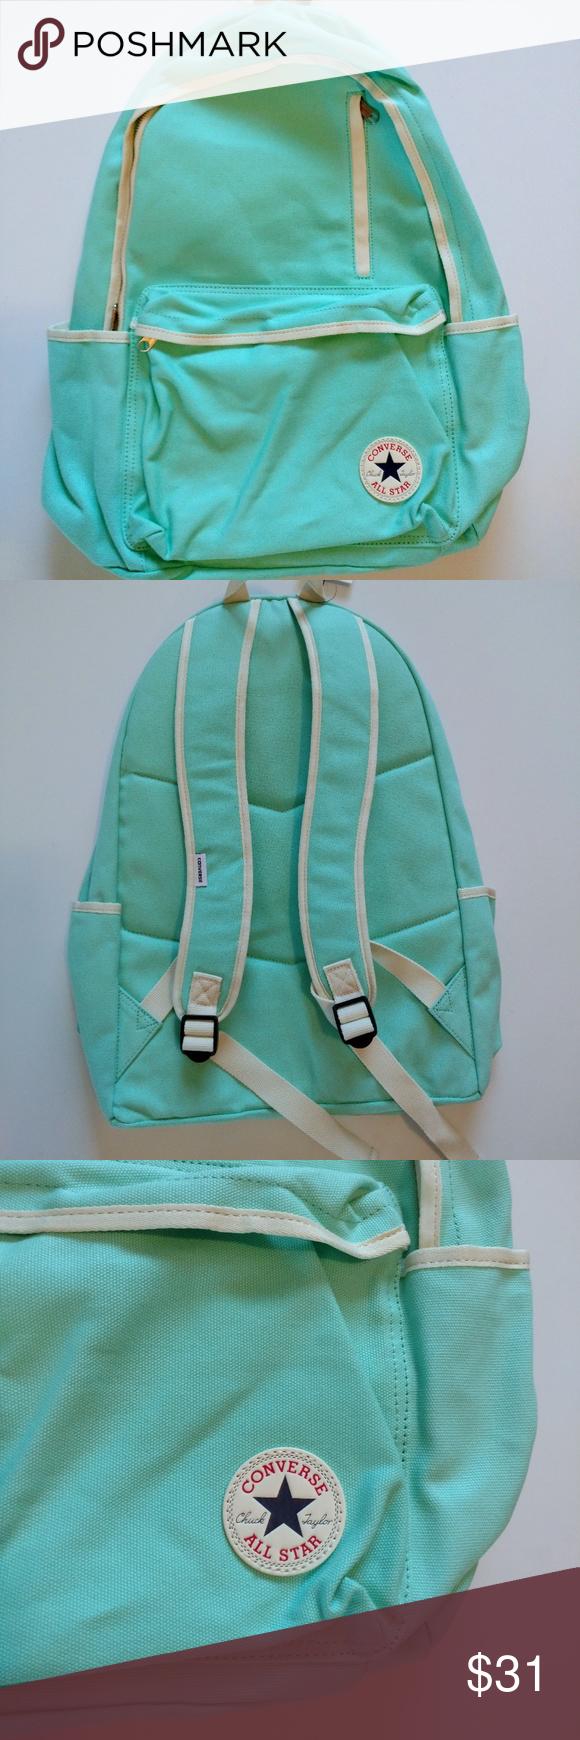 37f03ab50d45 Converse Go Teal Blue Aqua Backpack Chuck Taylor Condition  Brand new with  tags NWT Mint Color  Aqua Teal